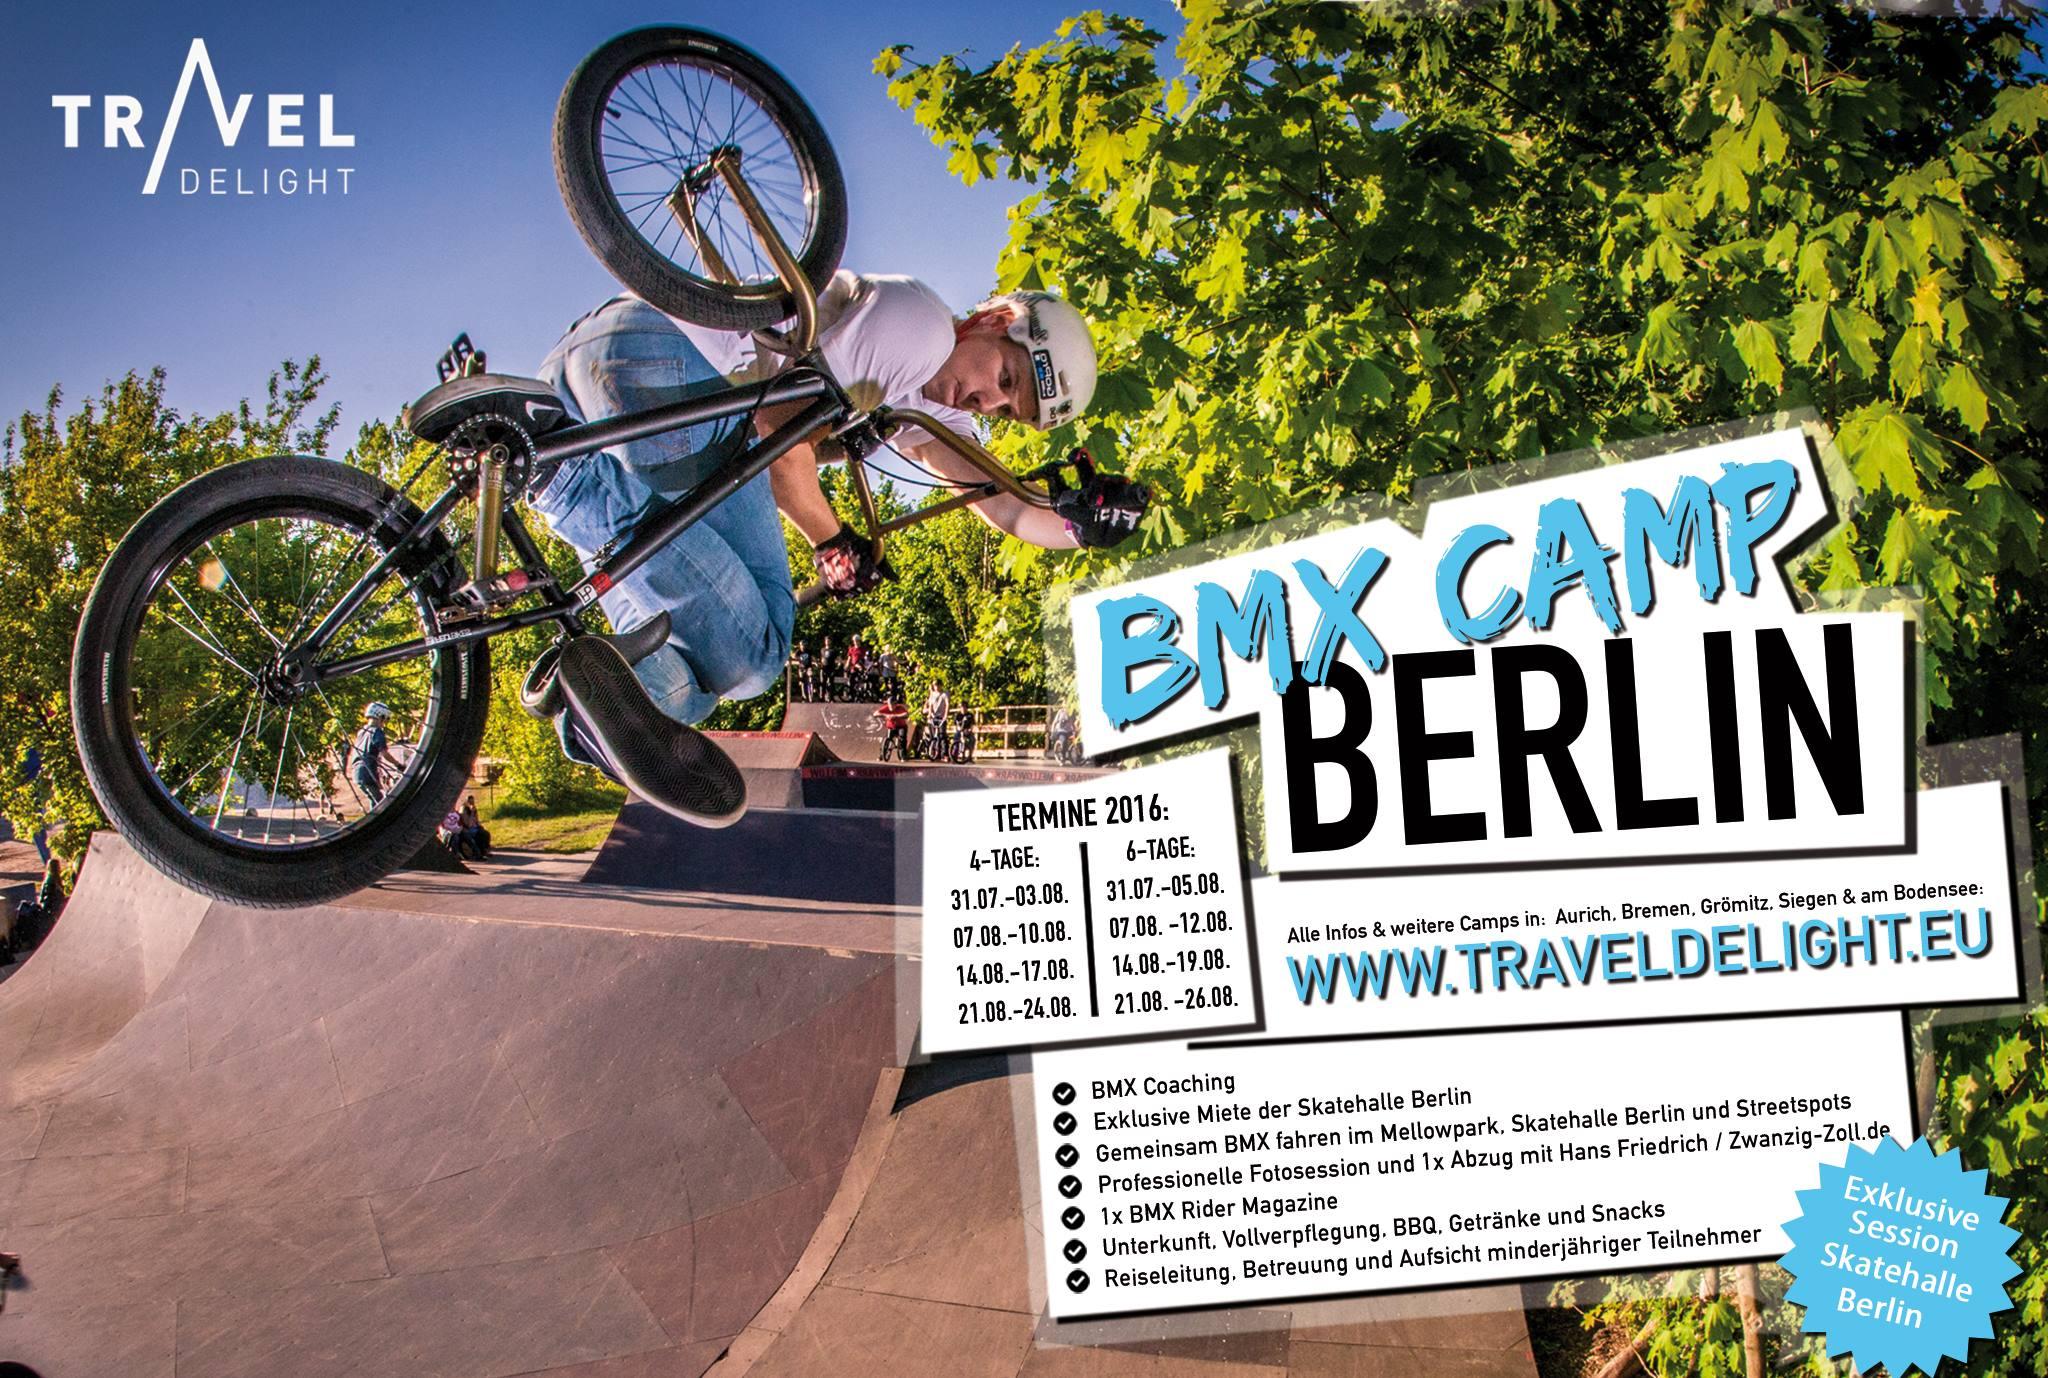 BMX Camp Berlin